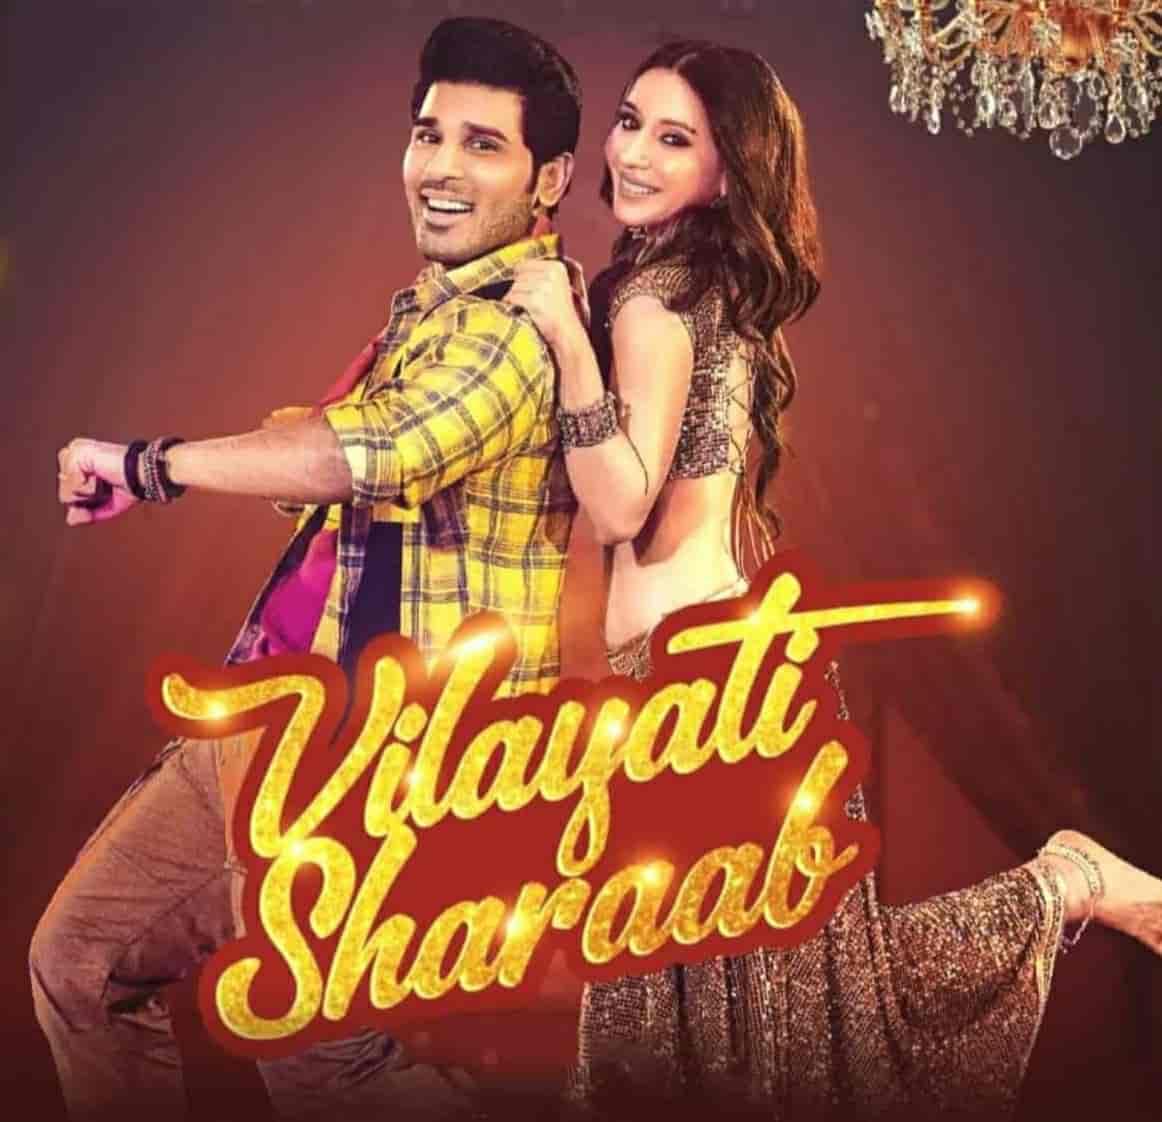 Vilayati Sharaab dance song lyrics, Sung By Darshan Raval and Neeti Mohan.